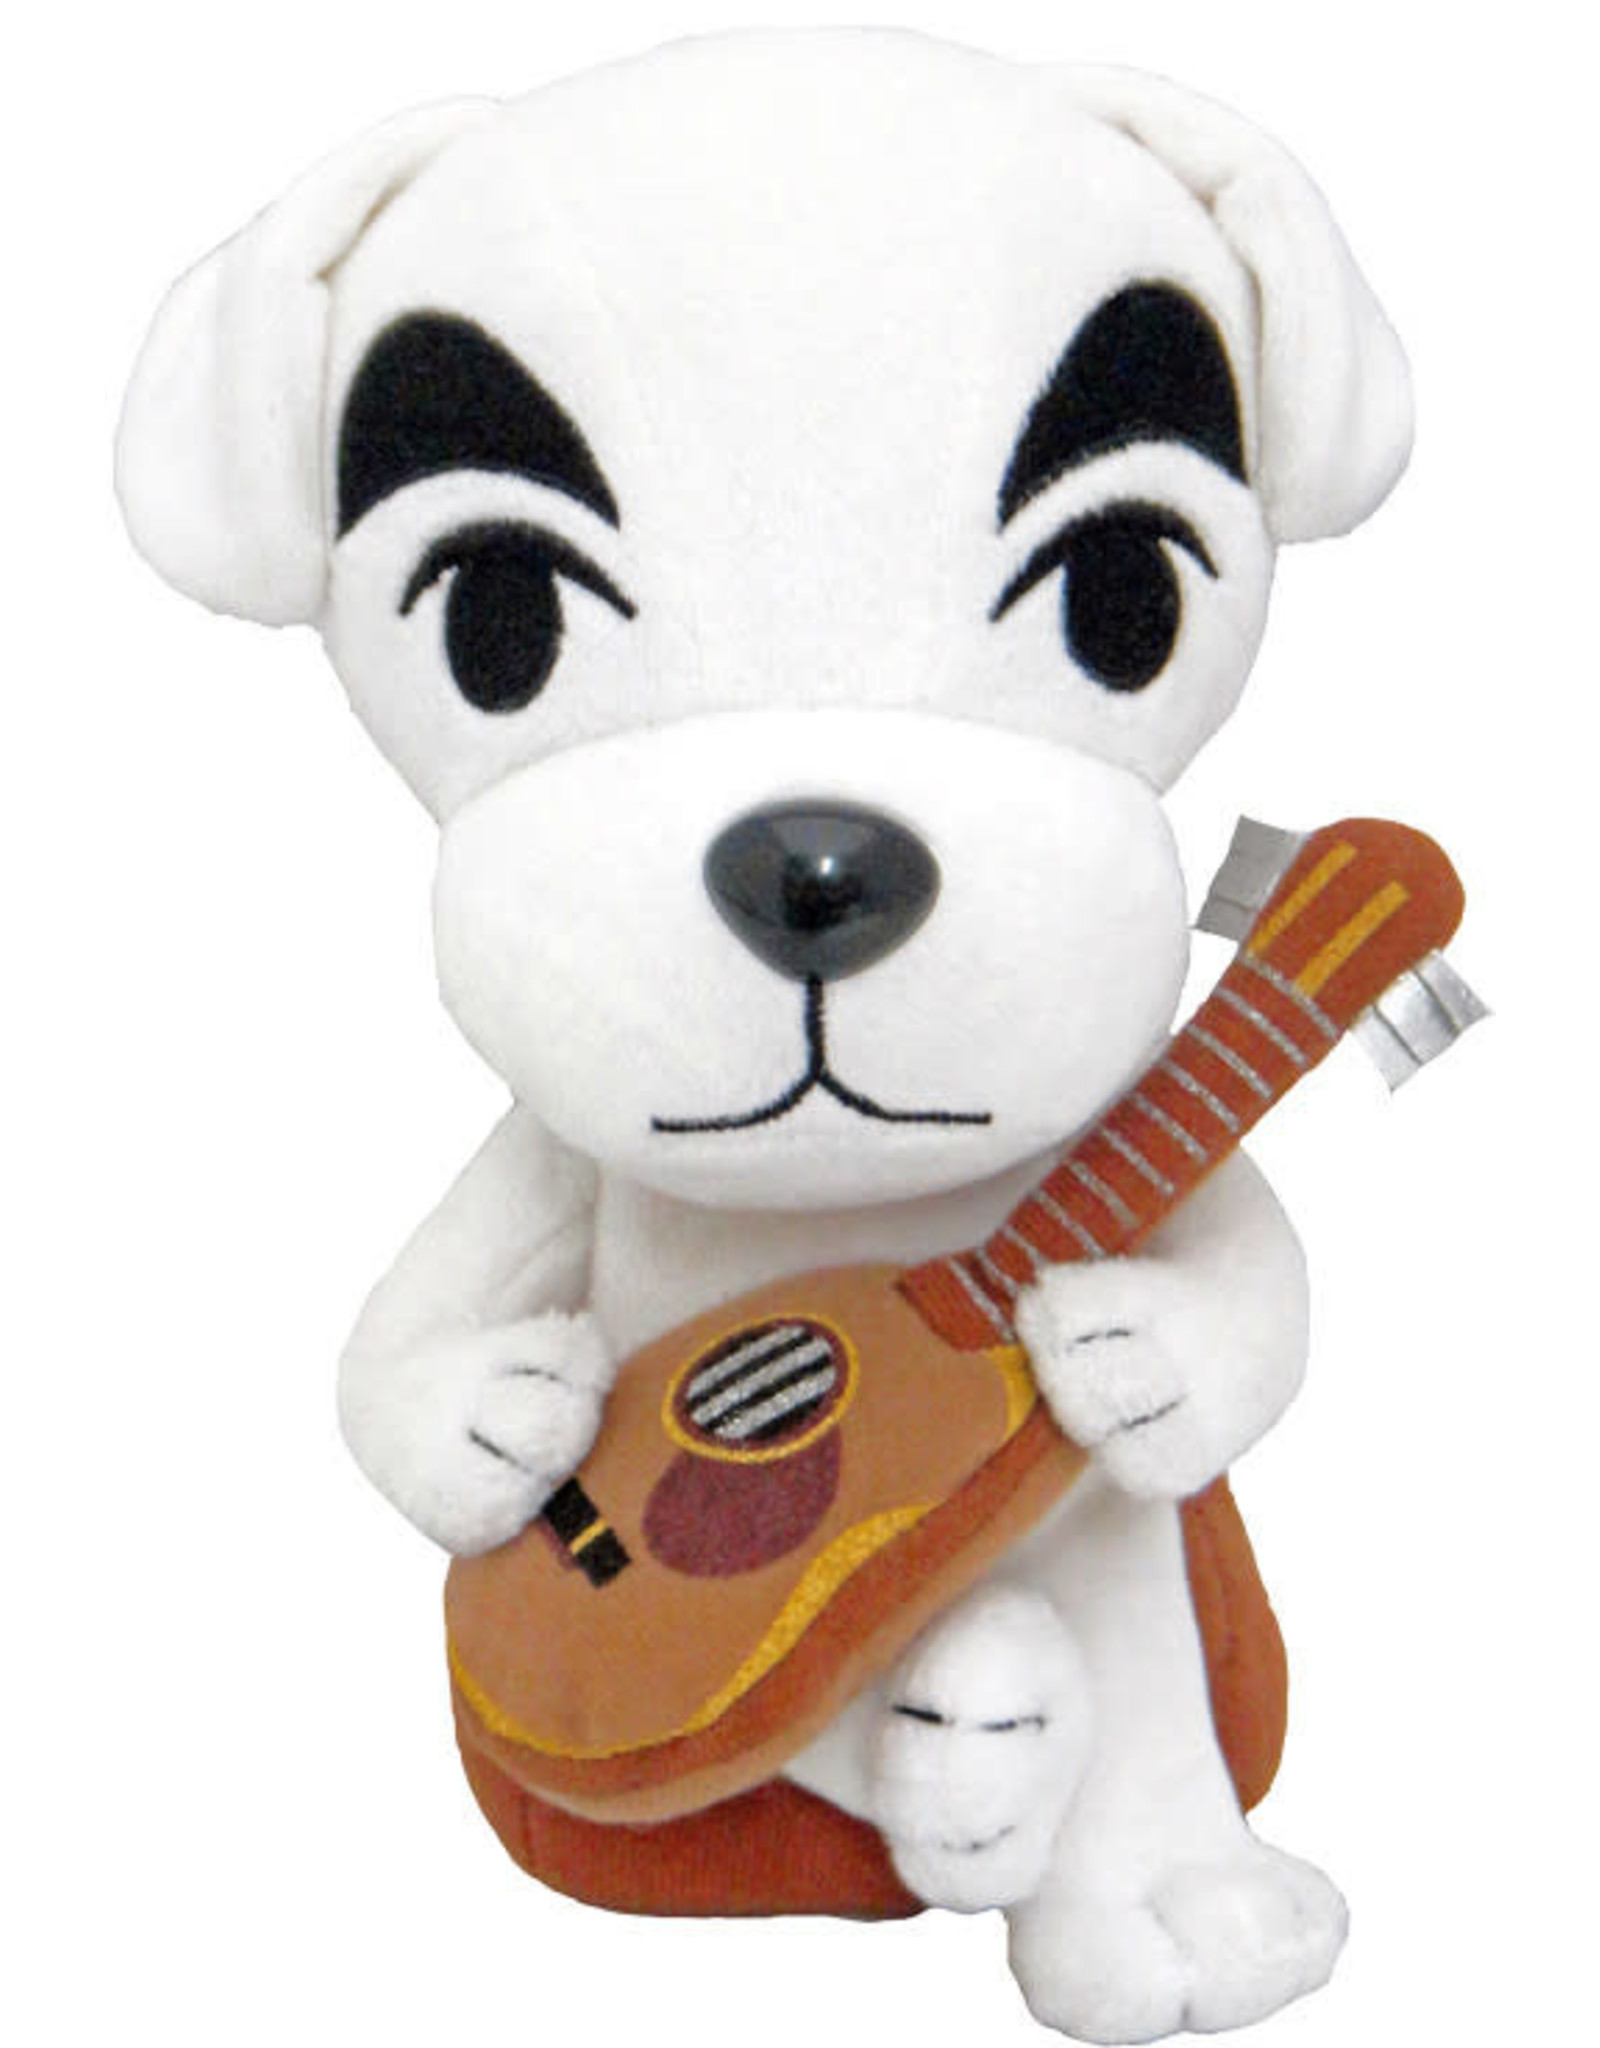 Animal Crossing Plushie - K.K. Slider - 20cm